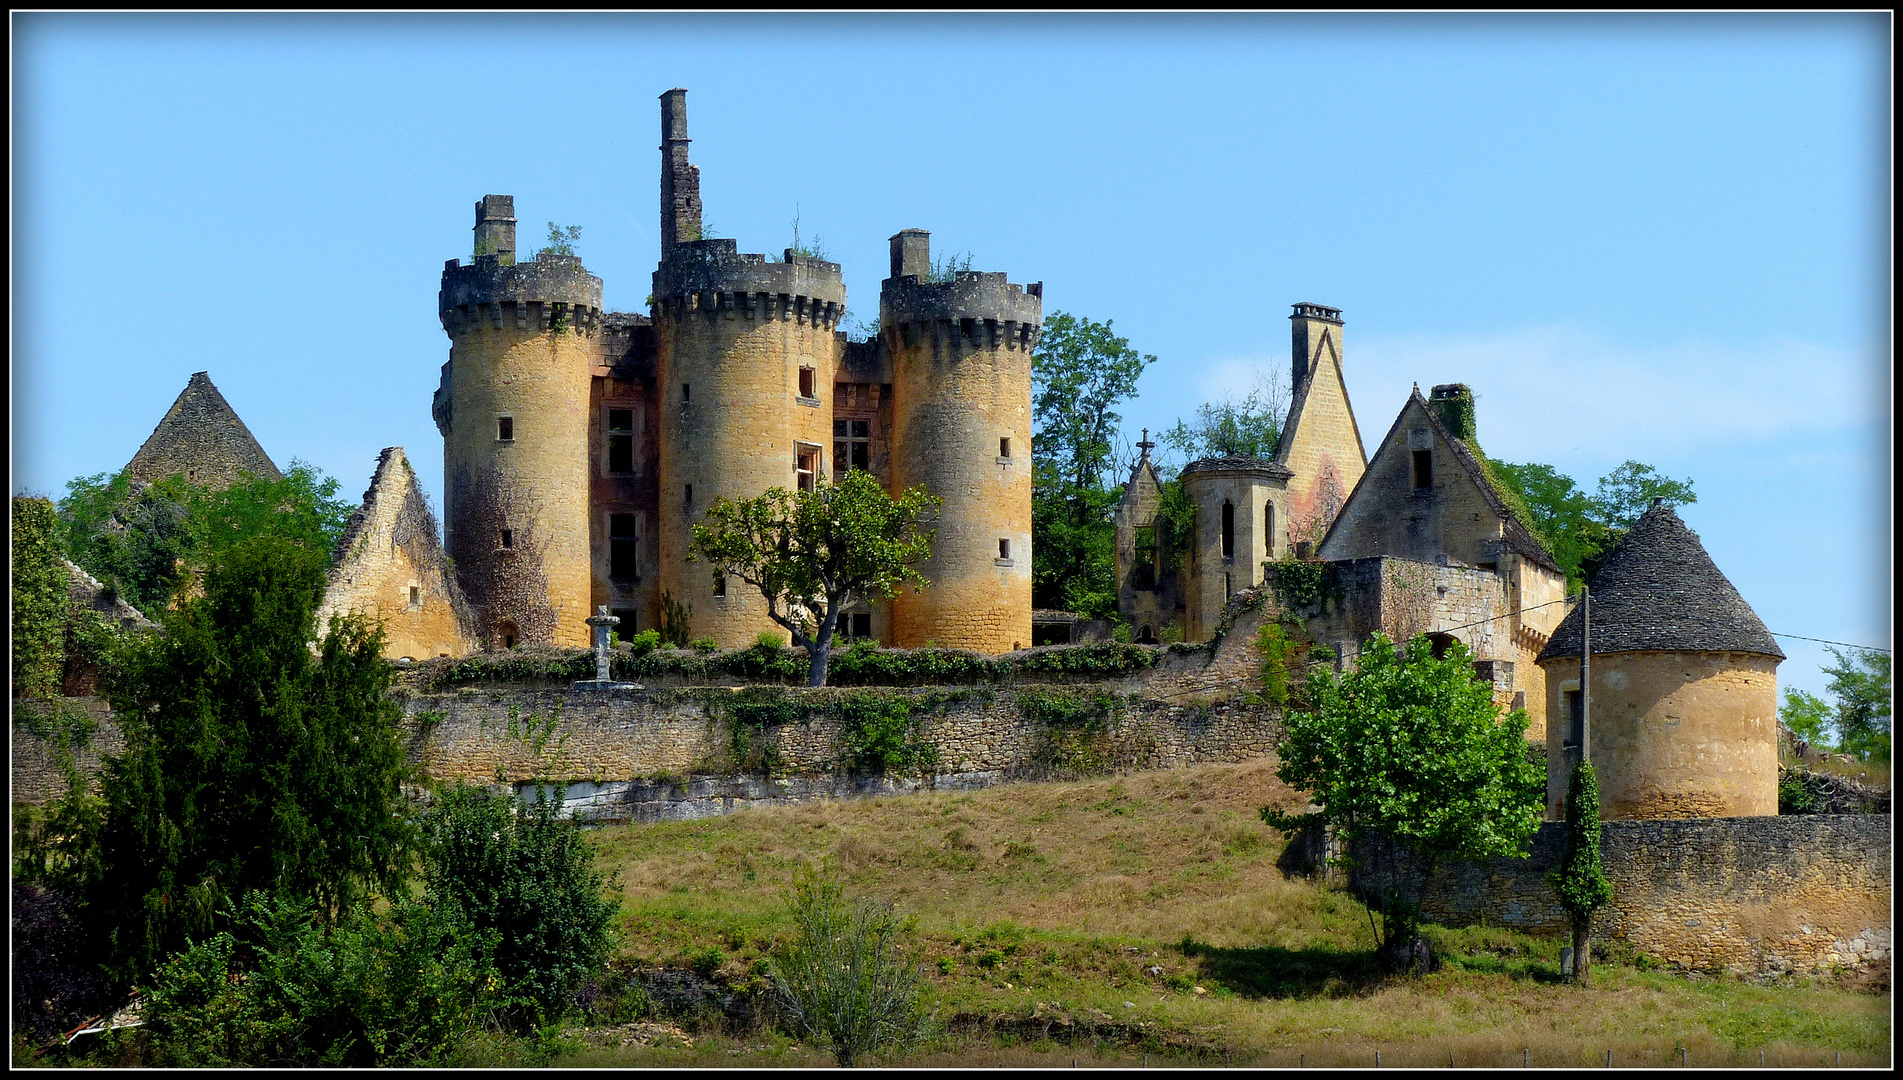 Balade en Limousin  - 07-2019 - Château de Paluel